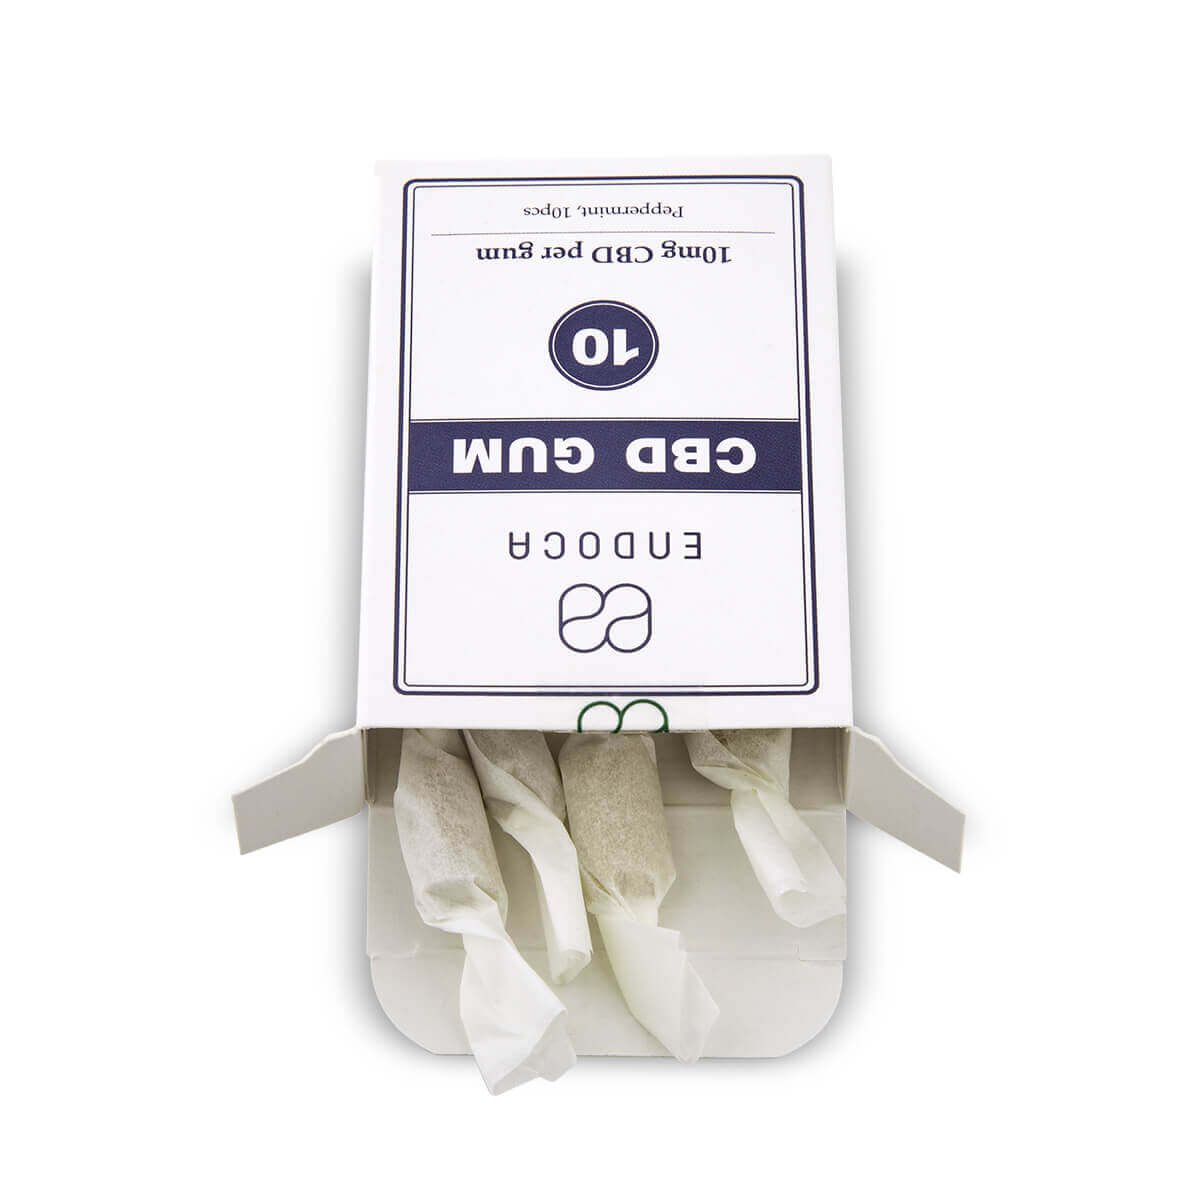 CBD Gum - Open box